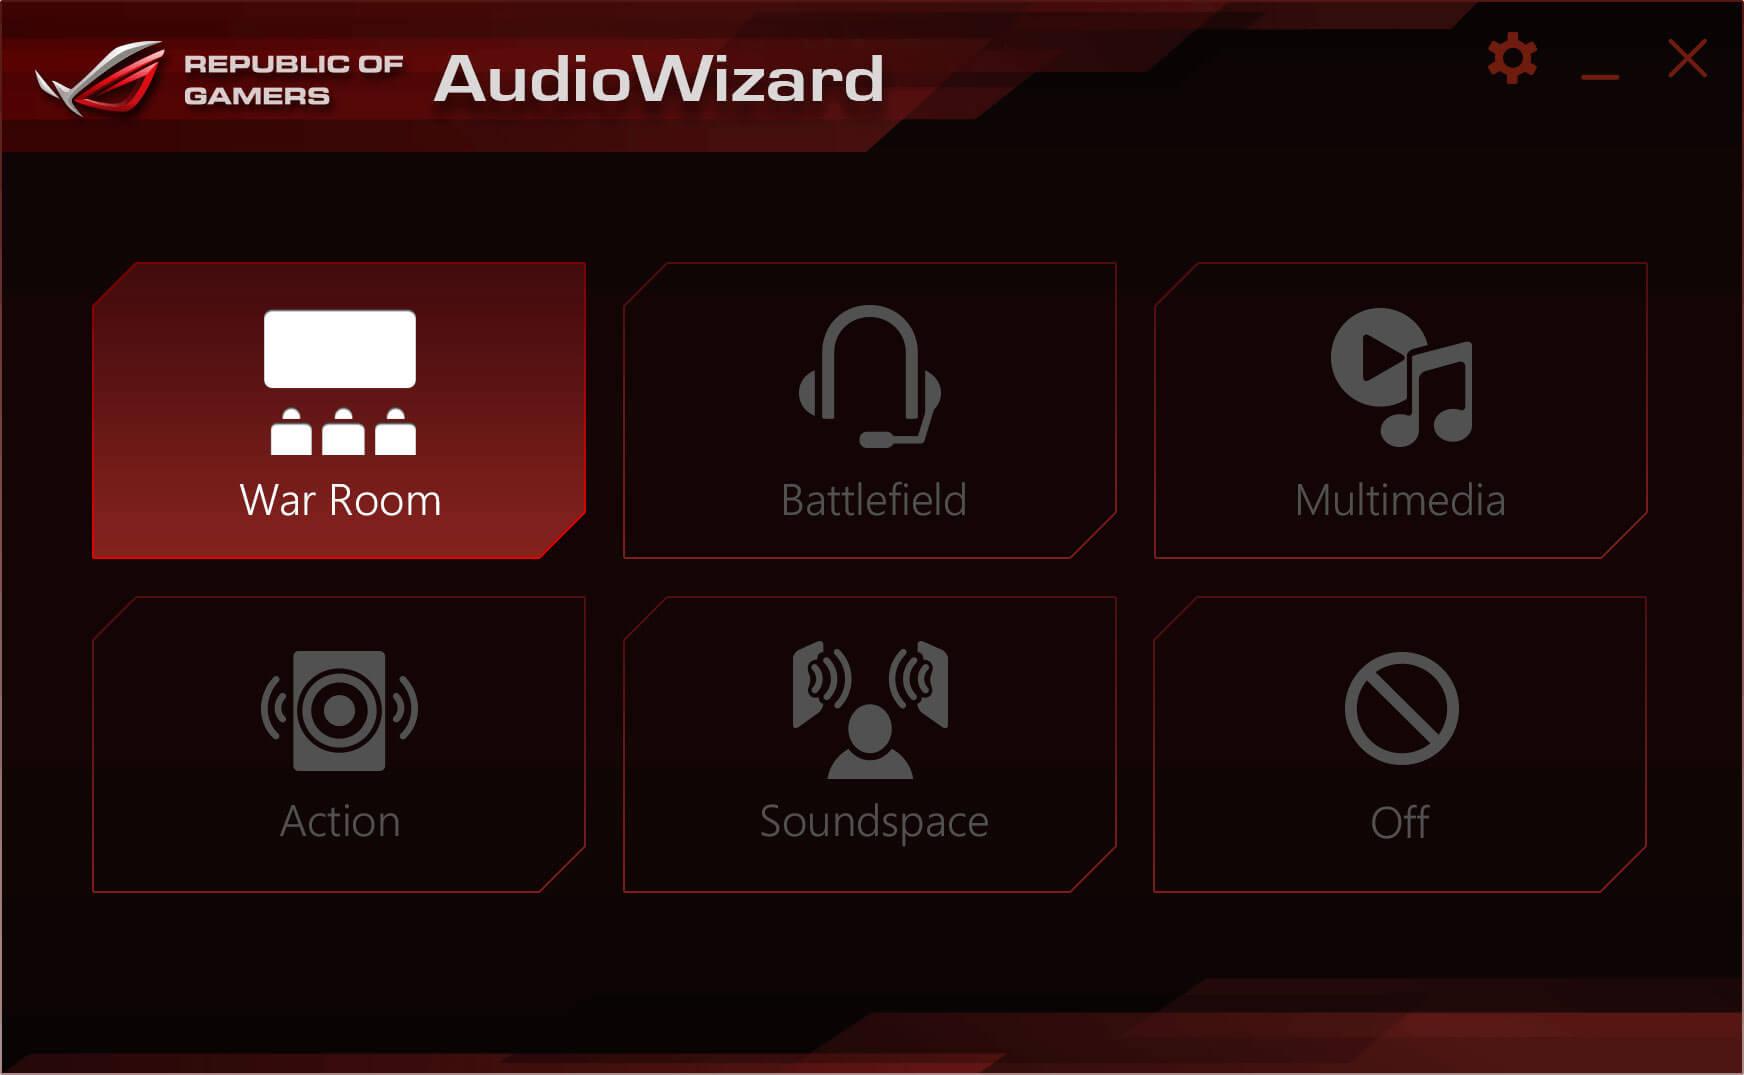 windows 10 application sound not working